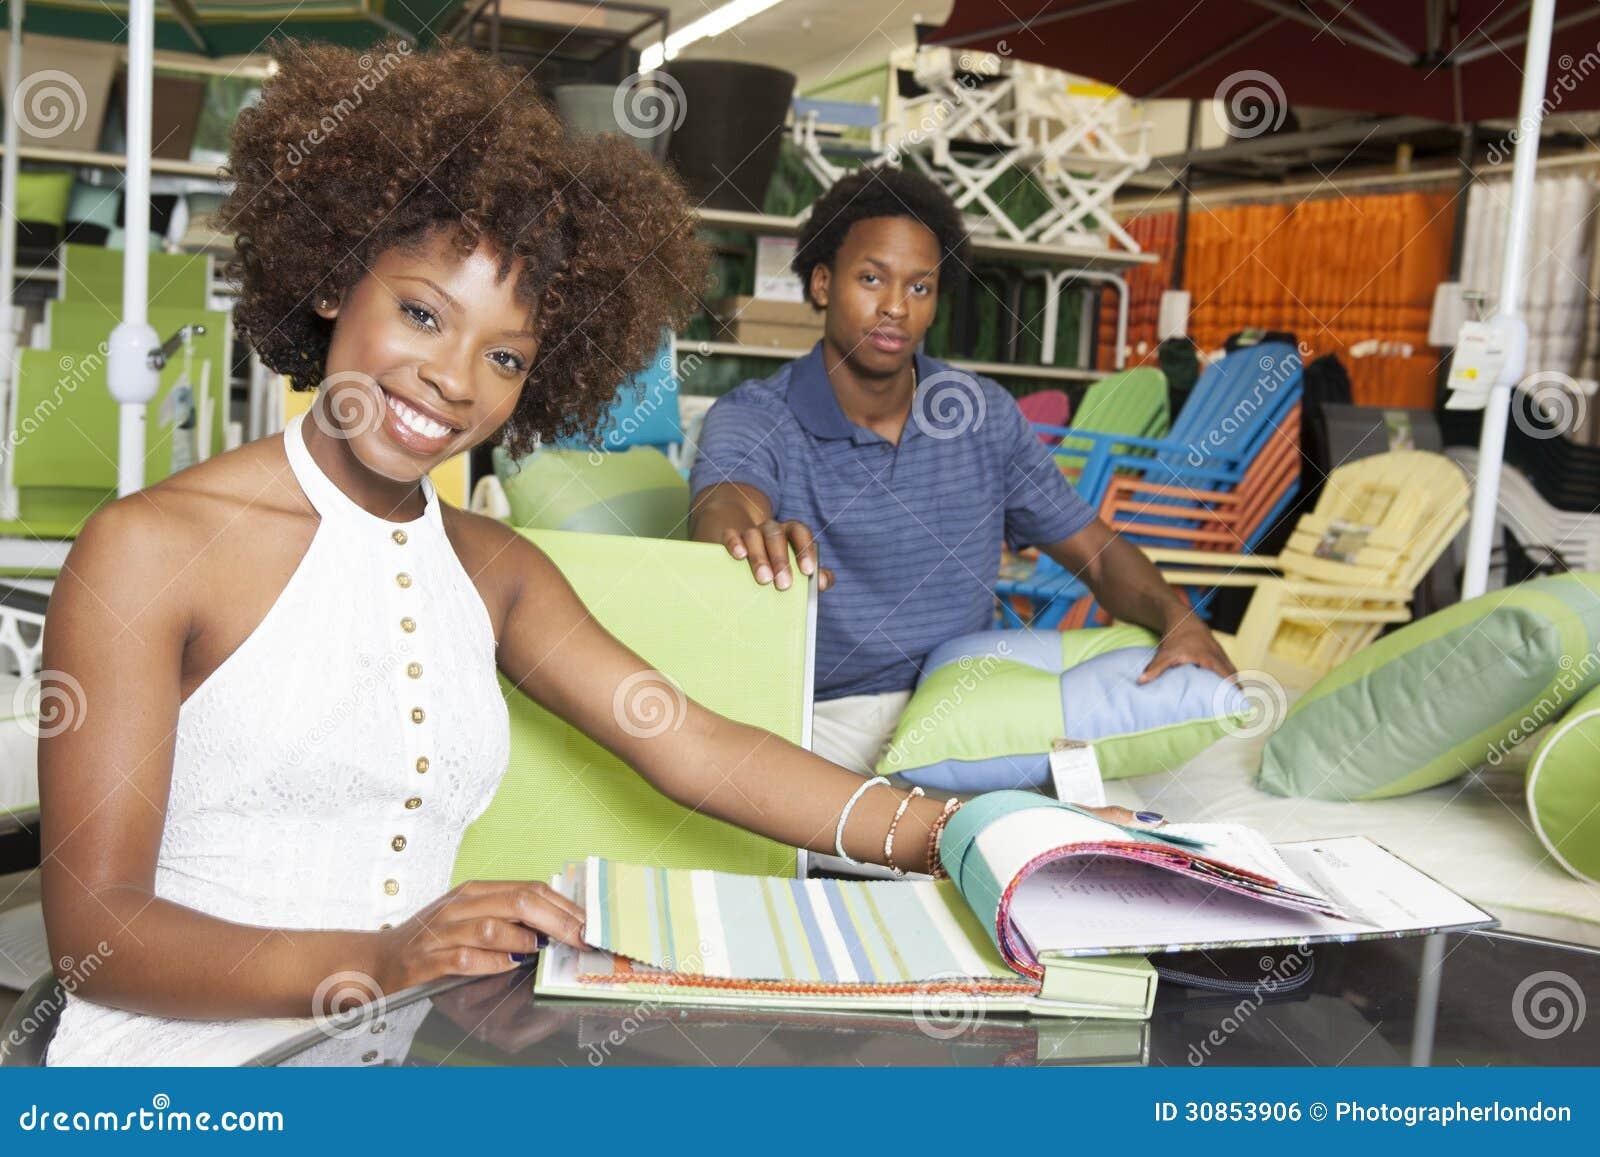 Outdoor furniture business plan